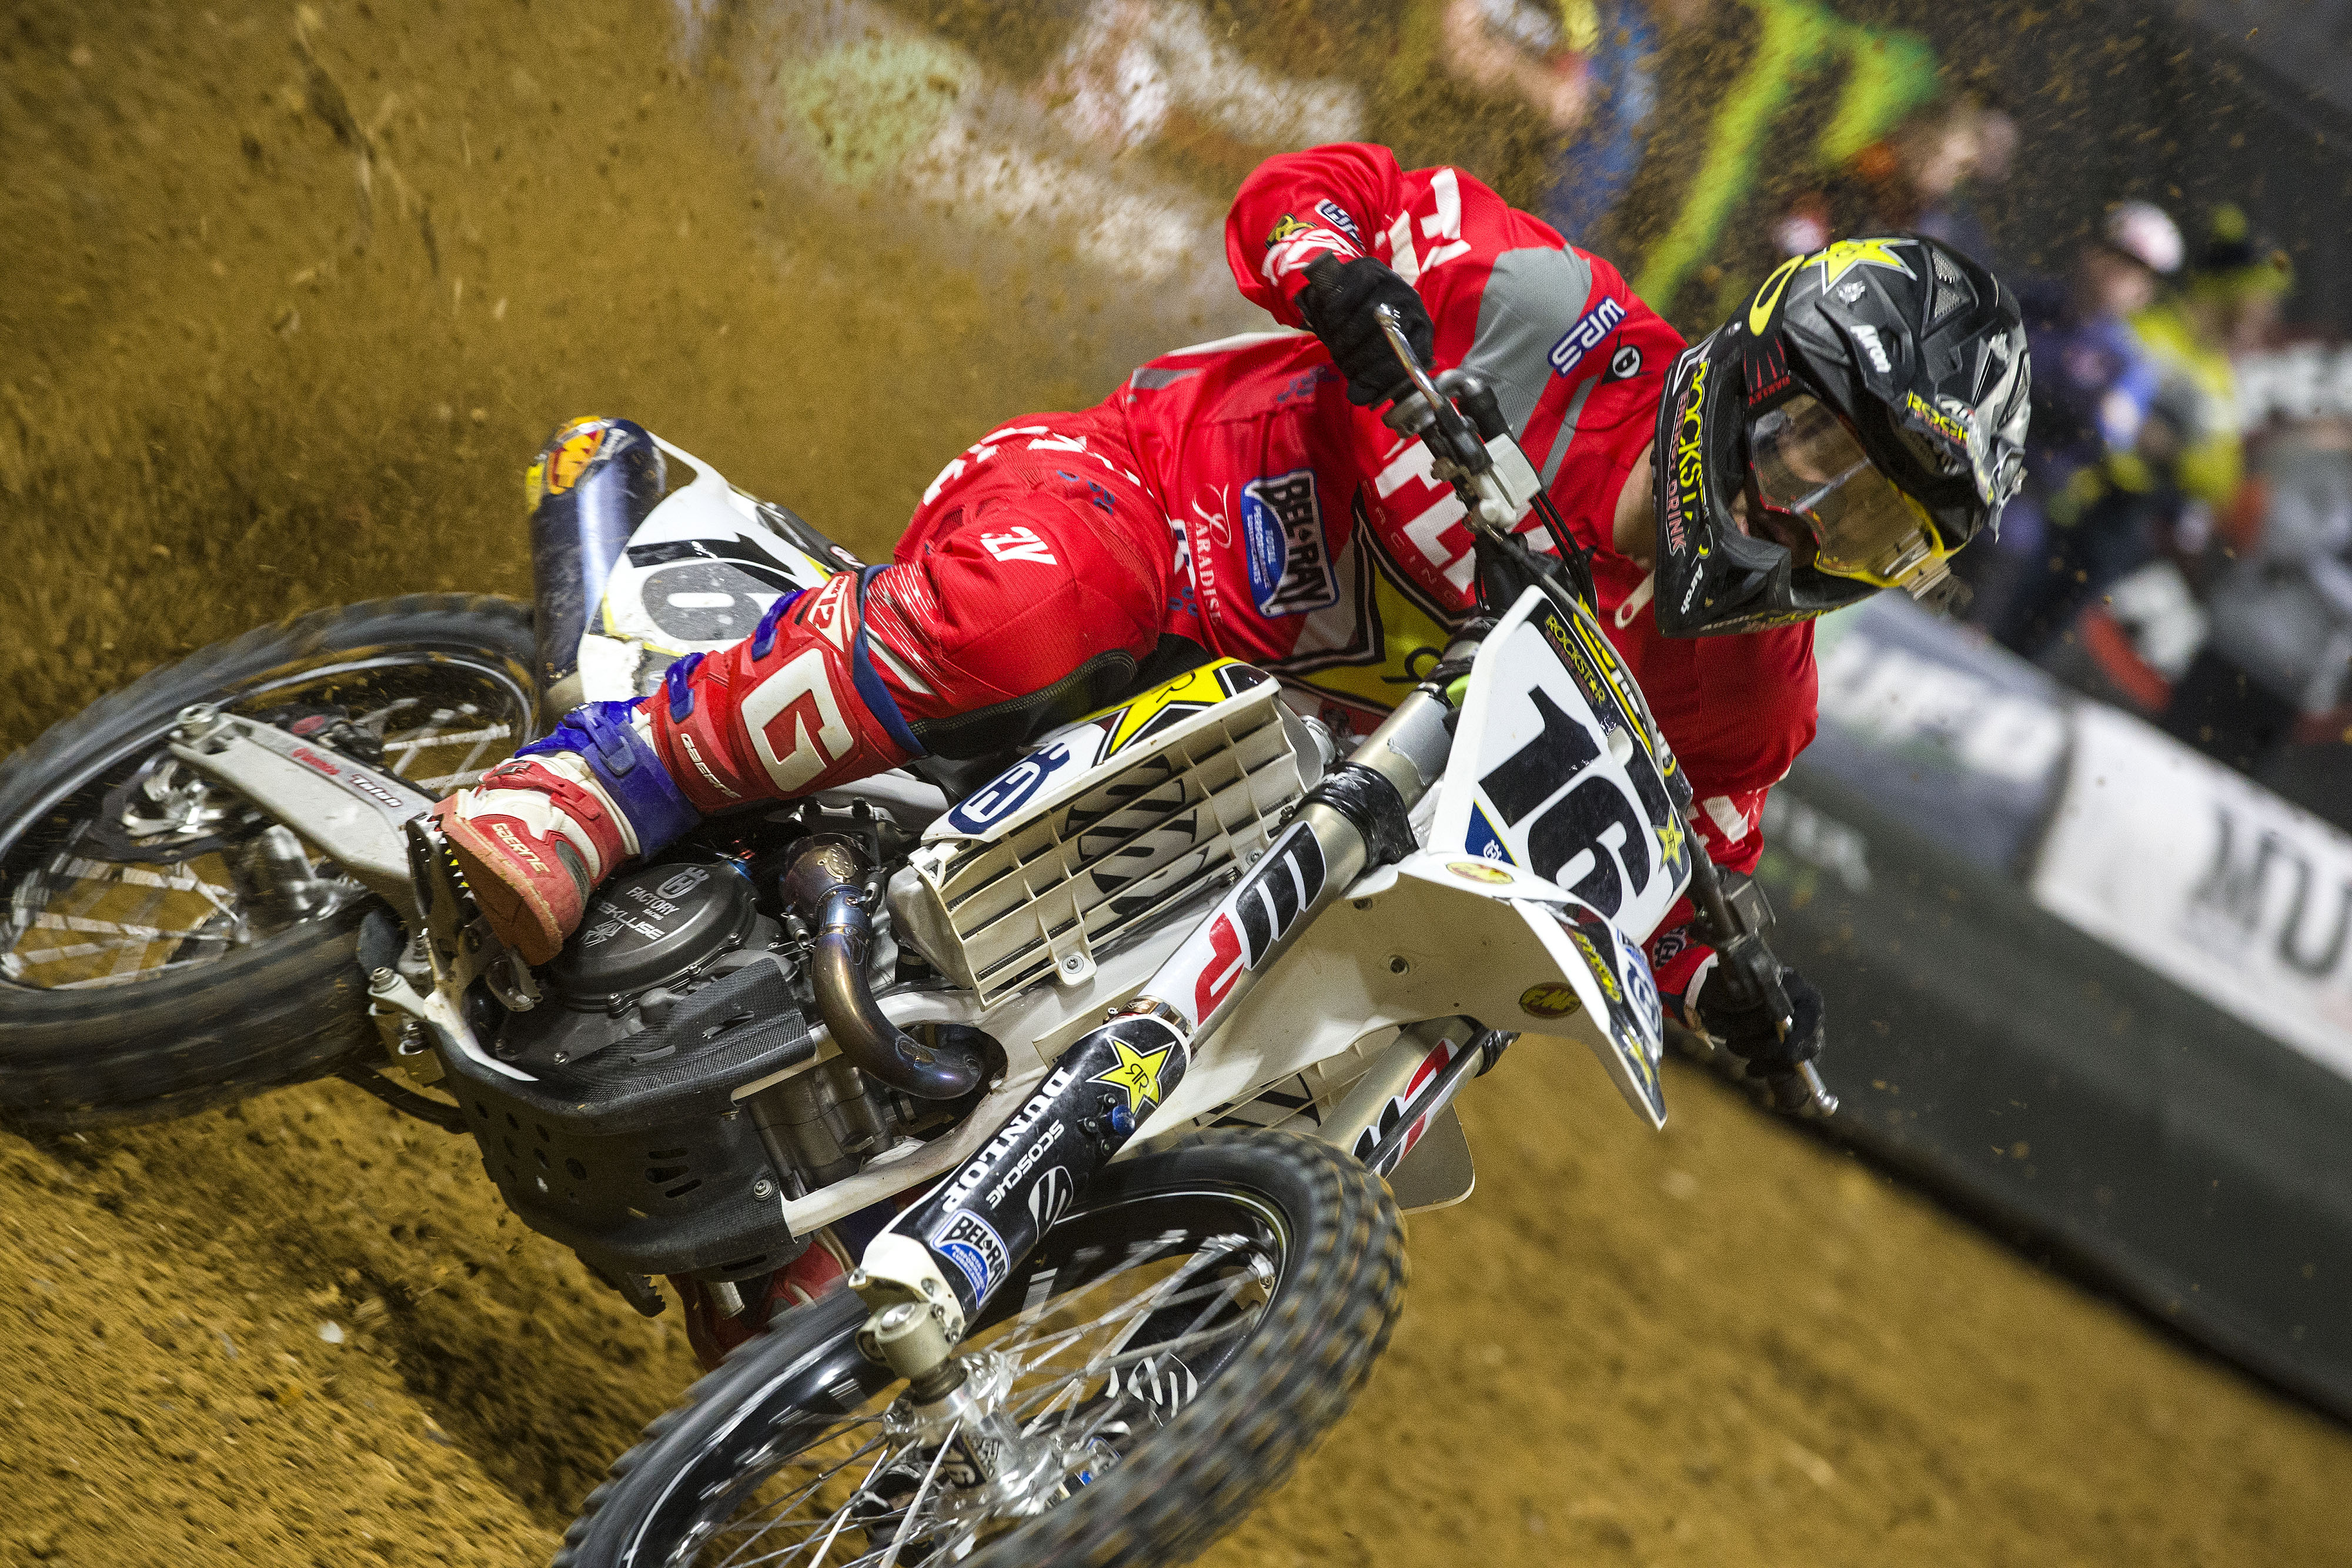 Paris SX - Zach Osborne - Rockstar Energy Husqvarna Factory Racing-1